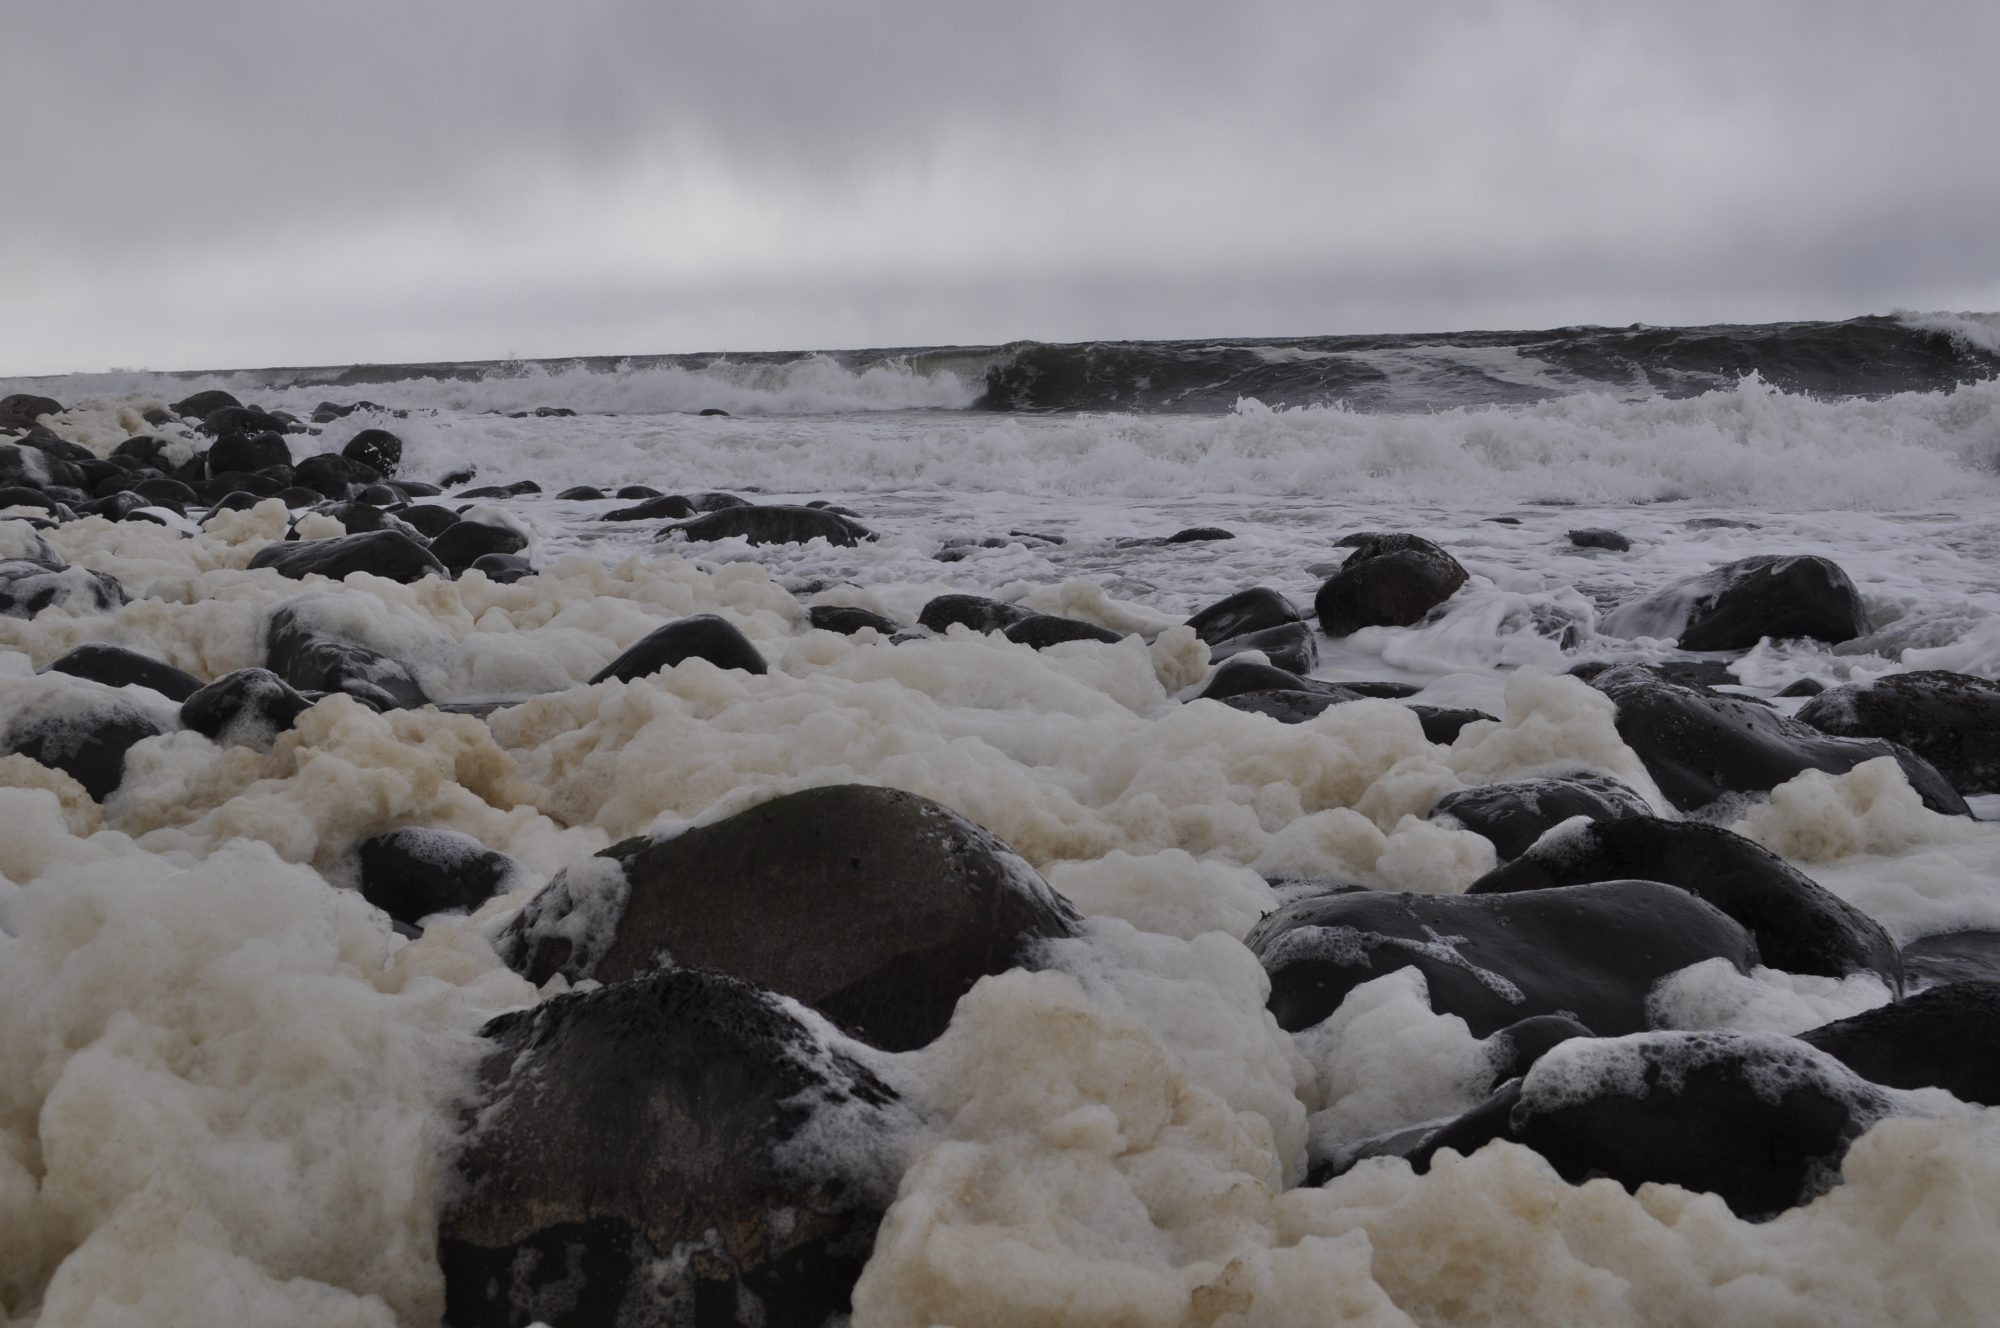 Sea Foam on the shore's of The Cove in Seaside, Oregon